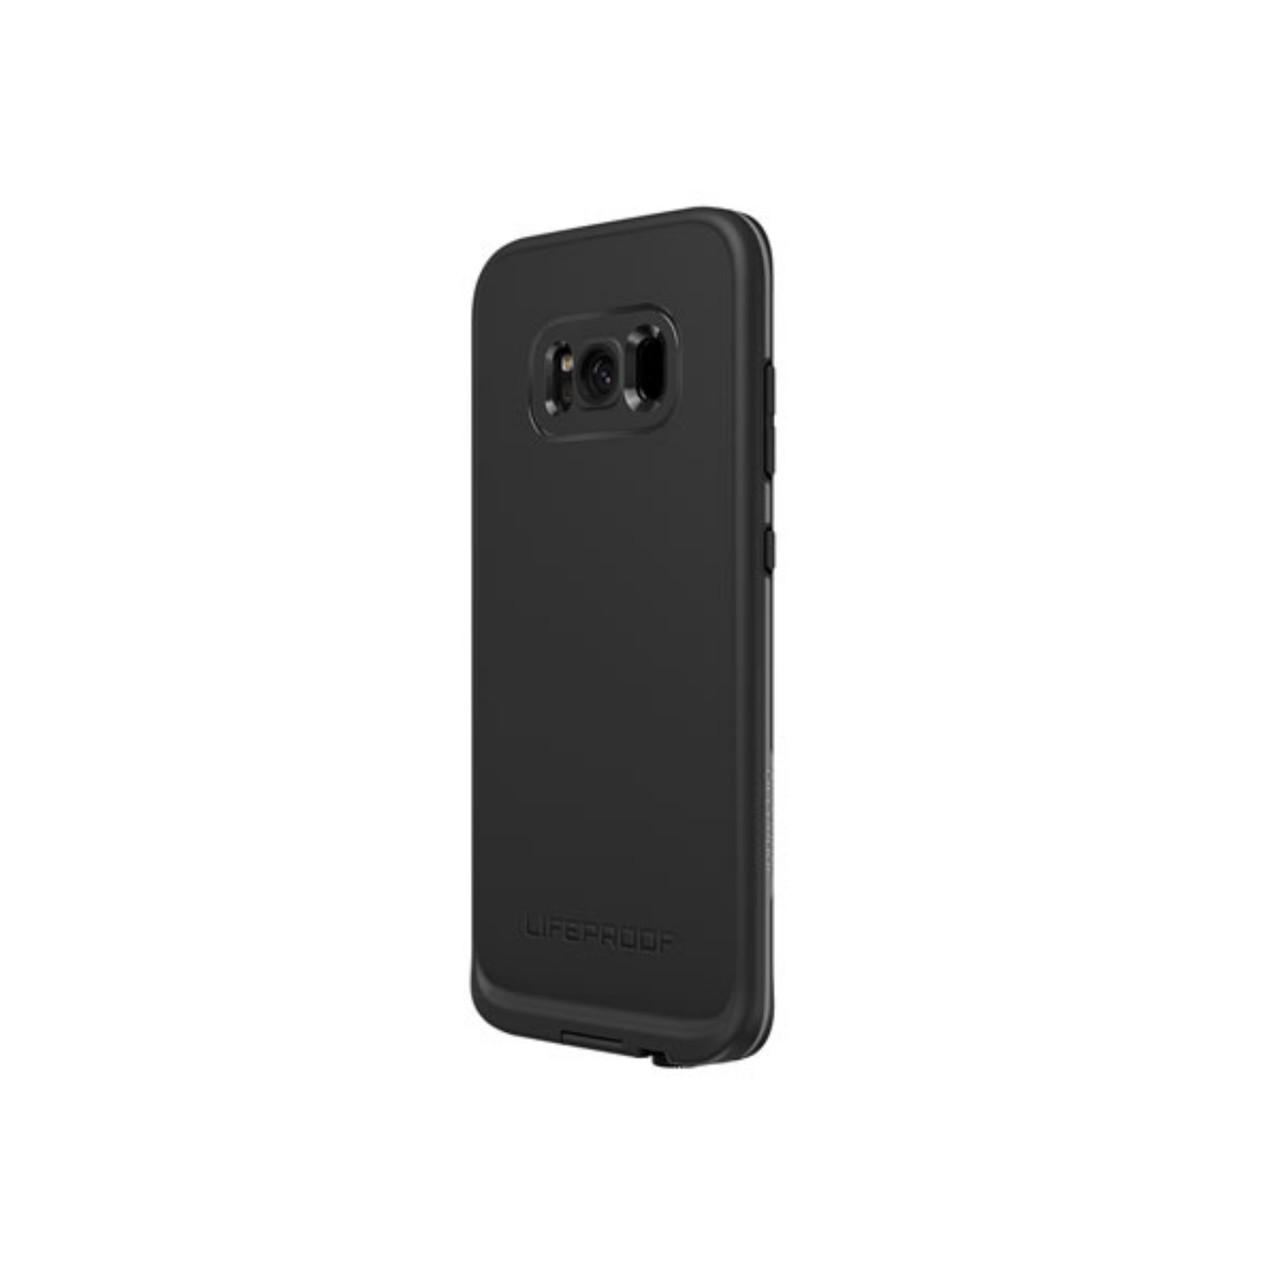 cheap for discount b43b4 14c8d Lifeproof Fre Case for Samsung Galaxy S8+ Asphalt Black